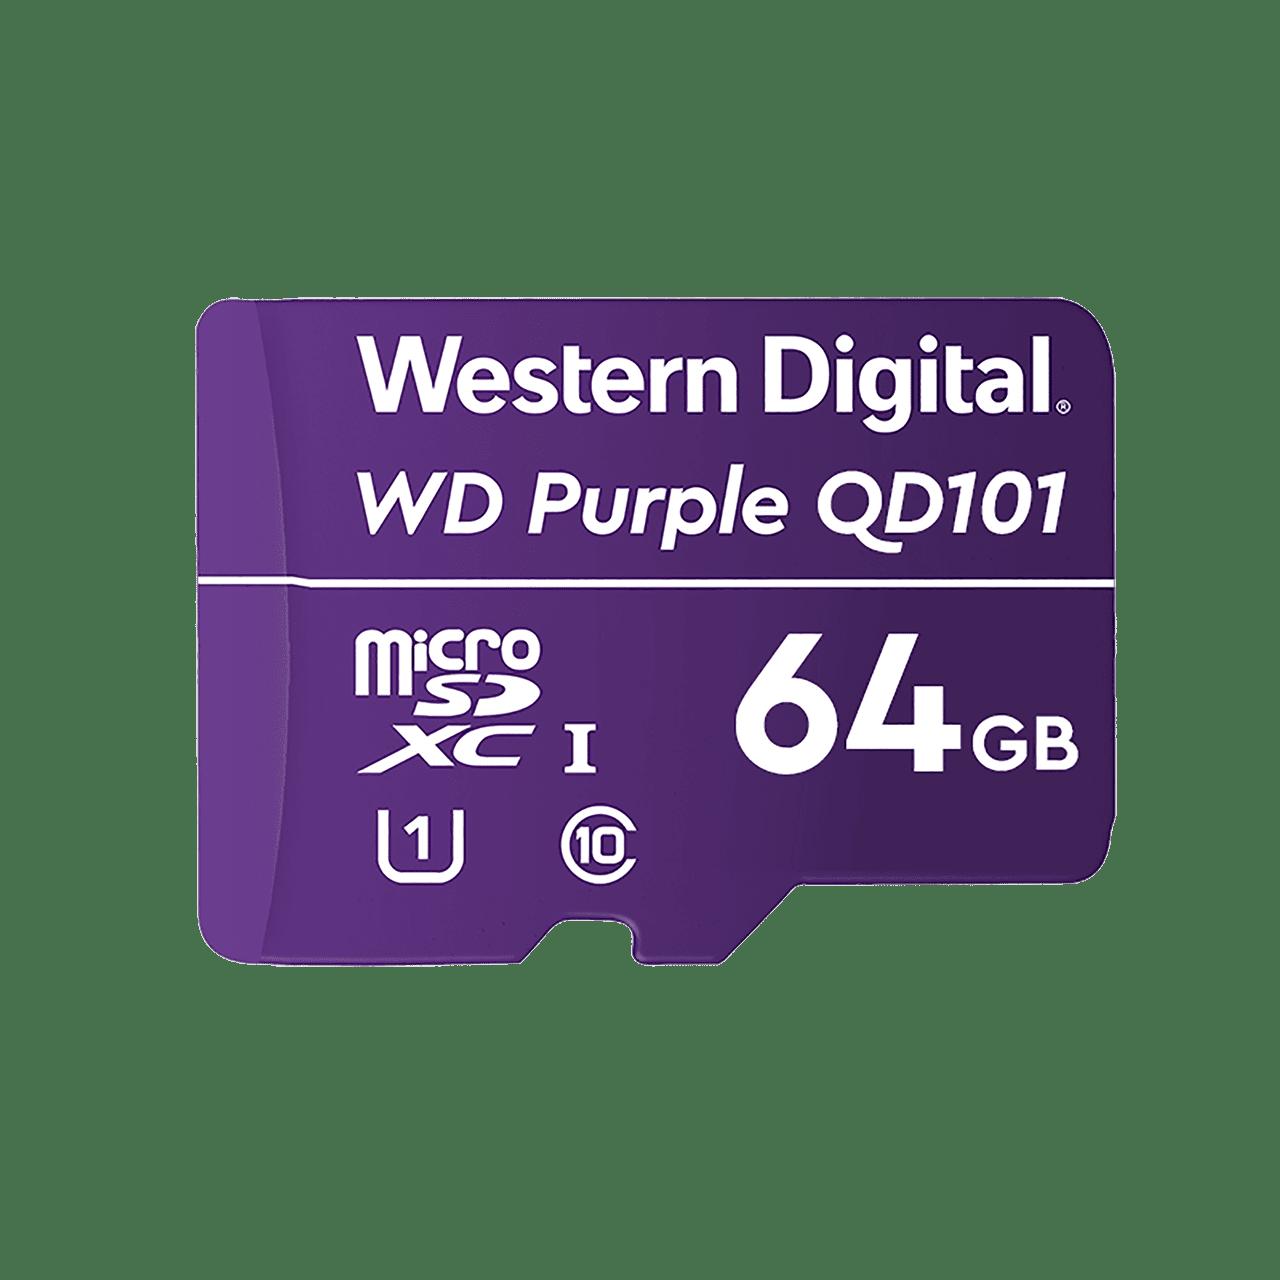 WD Purple microSDXC 64GB Class 10 U1 - WDD064G1P0C